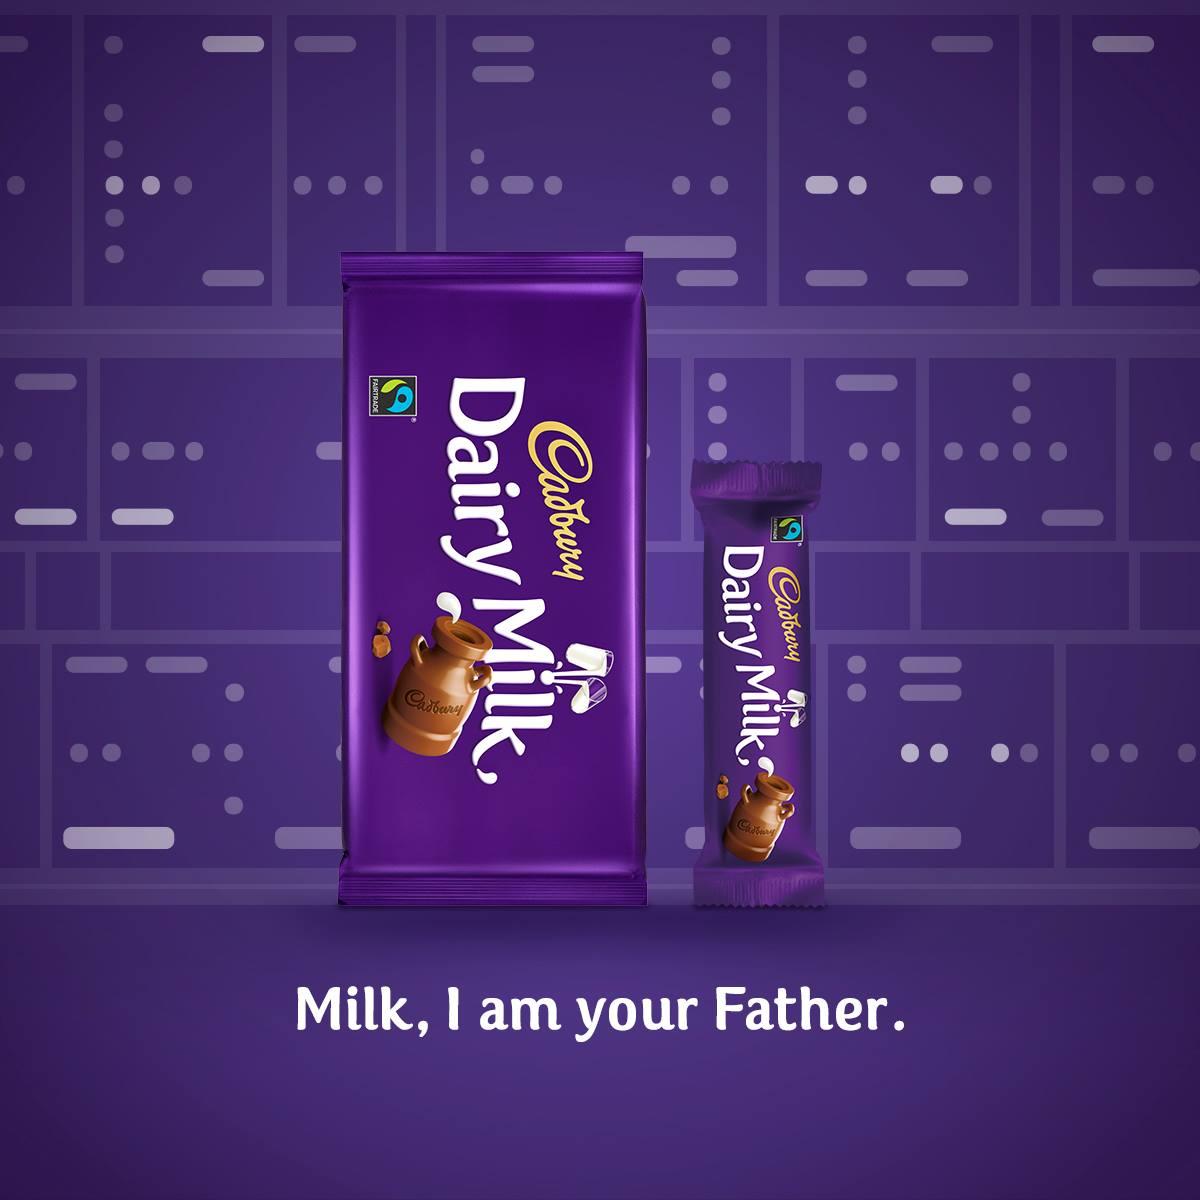 Cadbury-milk-aldie-1.jpg